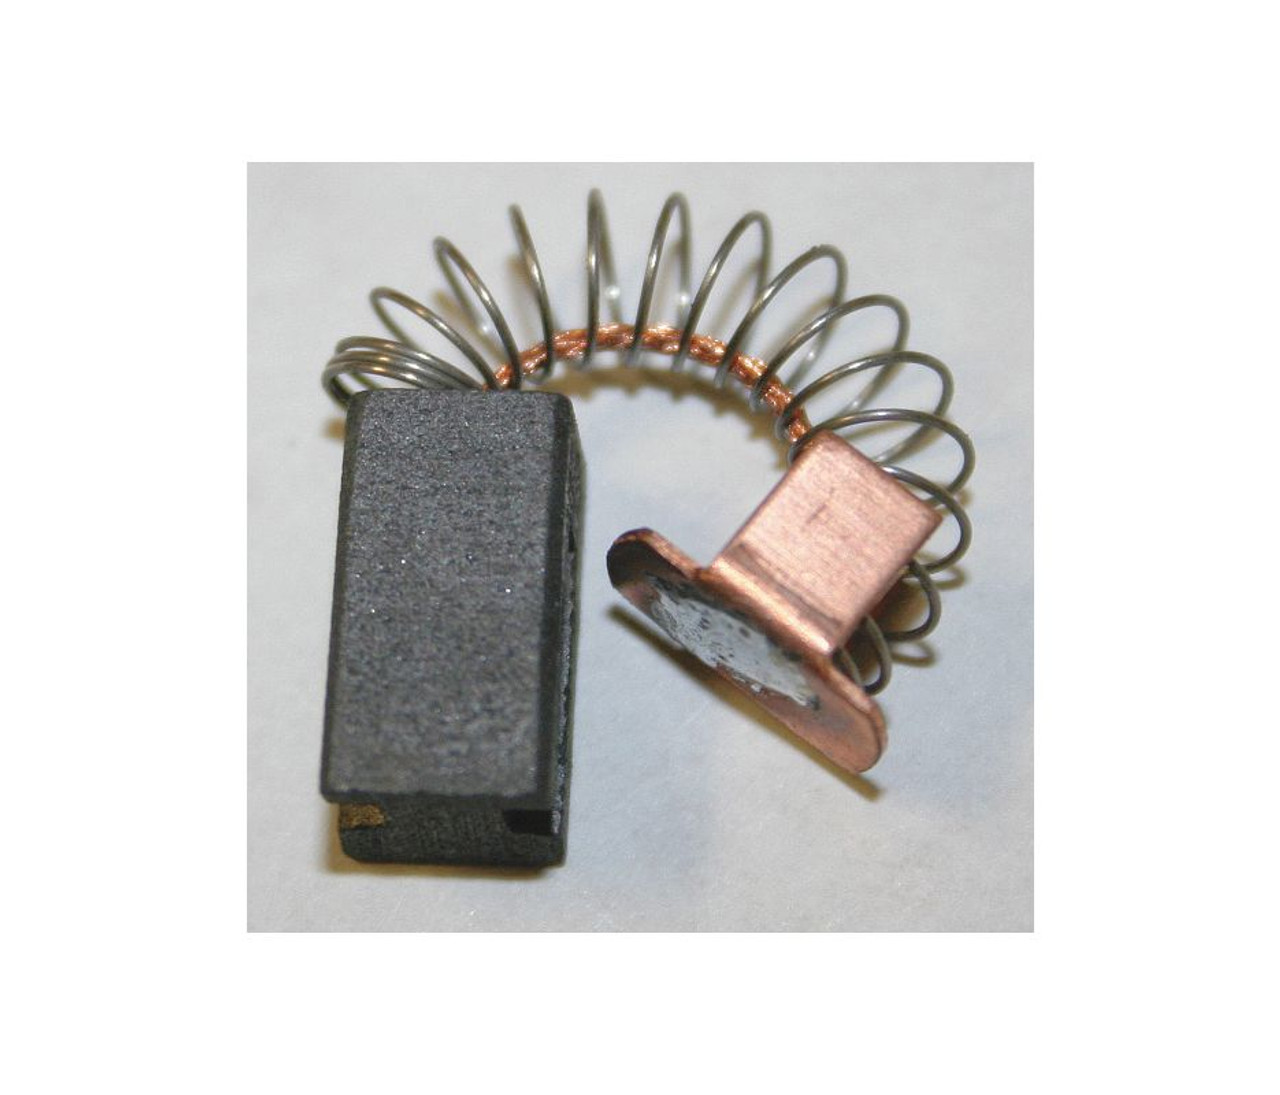 DAYTON 1MDU9 AC//DC Replacement Motor,5000 RPM,115V